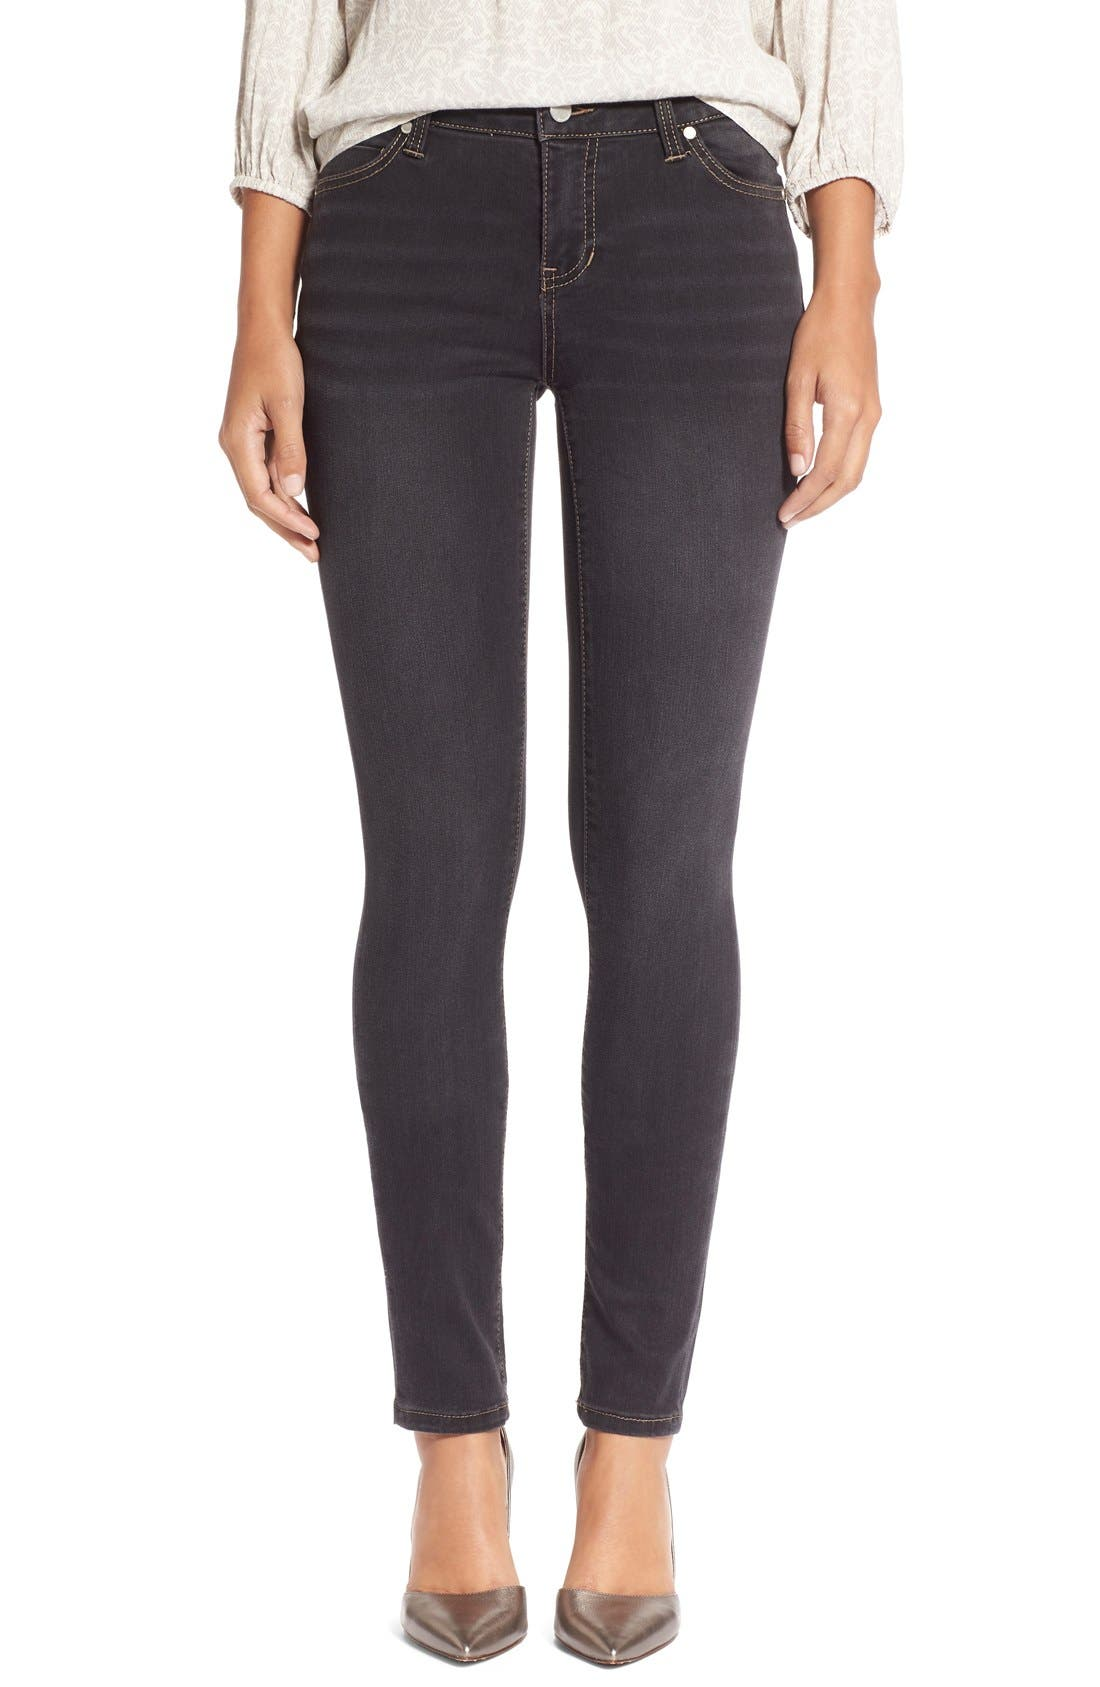 Liverpool Jeans Company 'Abby' StretchSkinny Jeans (Sulphur) (Petite)